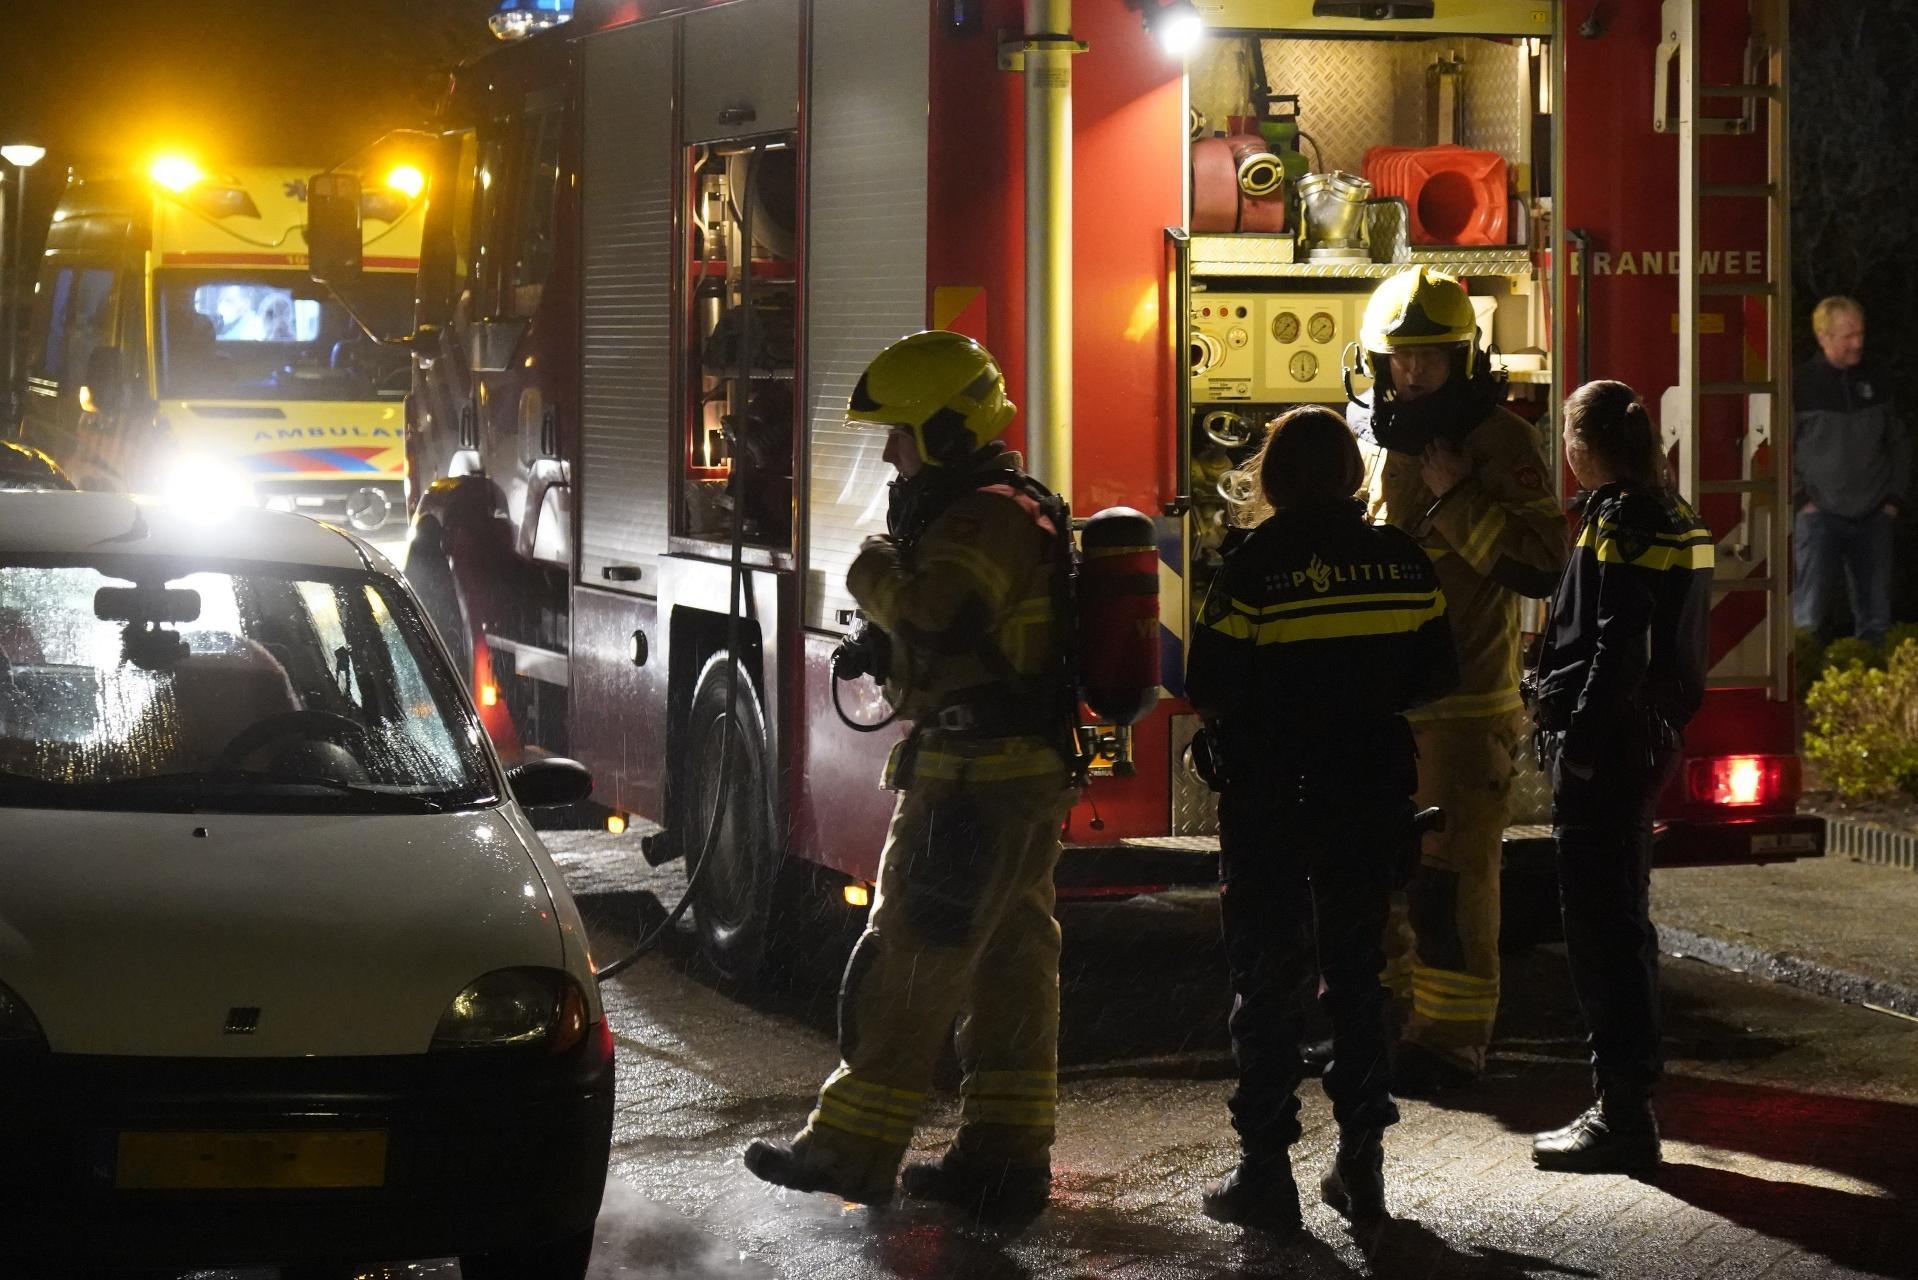 Droger veroorzaakt brand in woning Hippolytushoef, één bewoner gewond